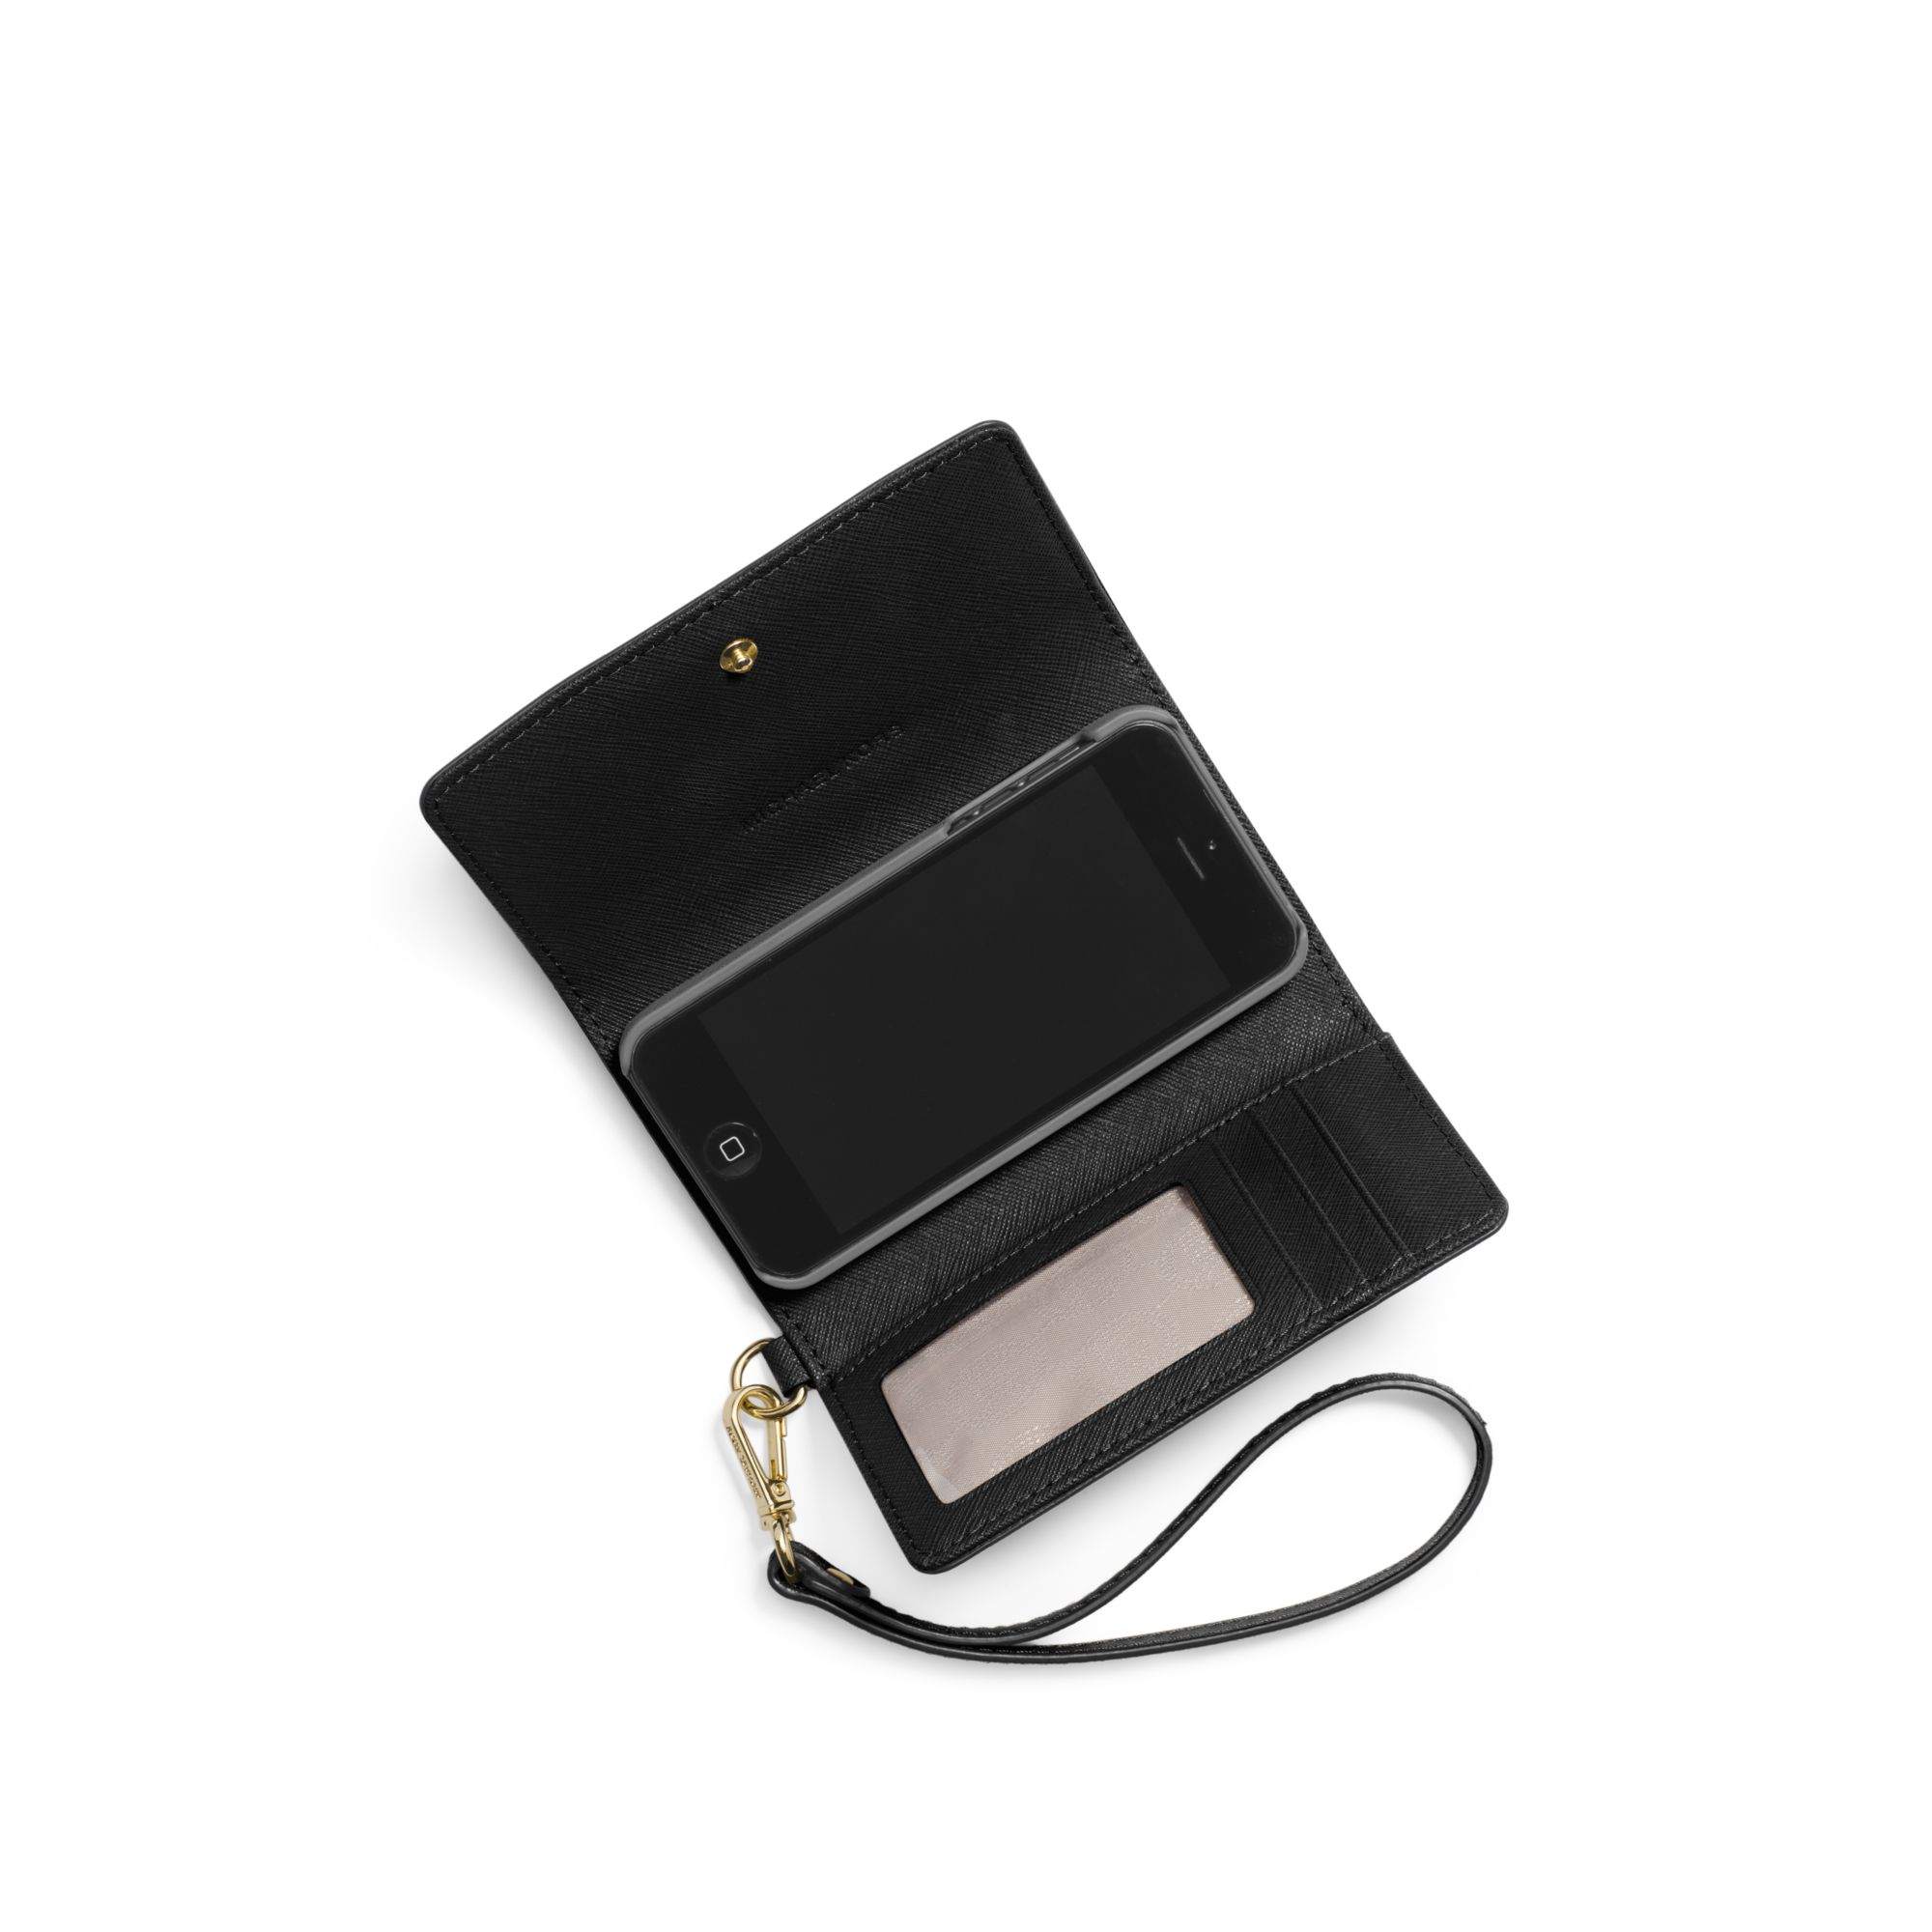 bb9cdf841c80 Lyst - Michael Kors Saffiano Leather Smartphone Wristlet in Black